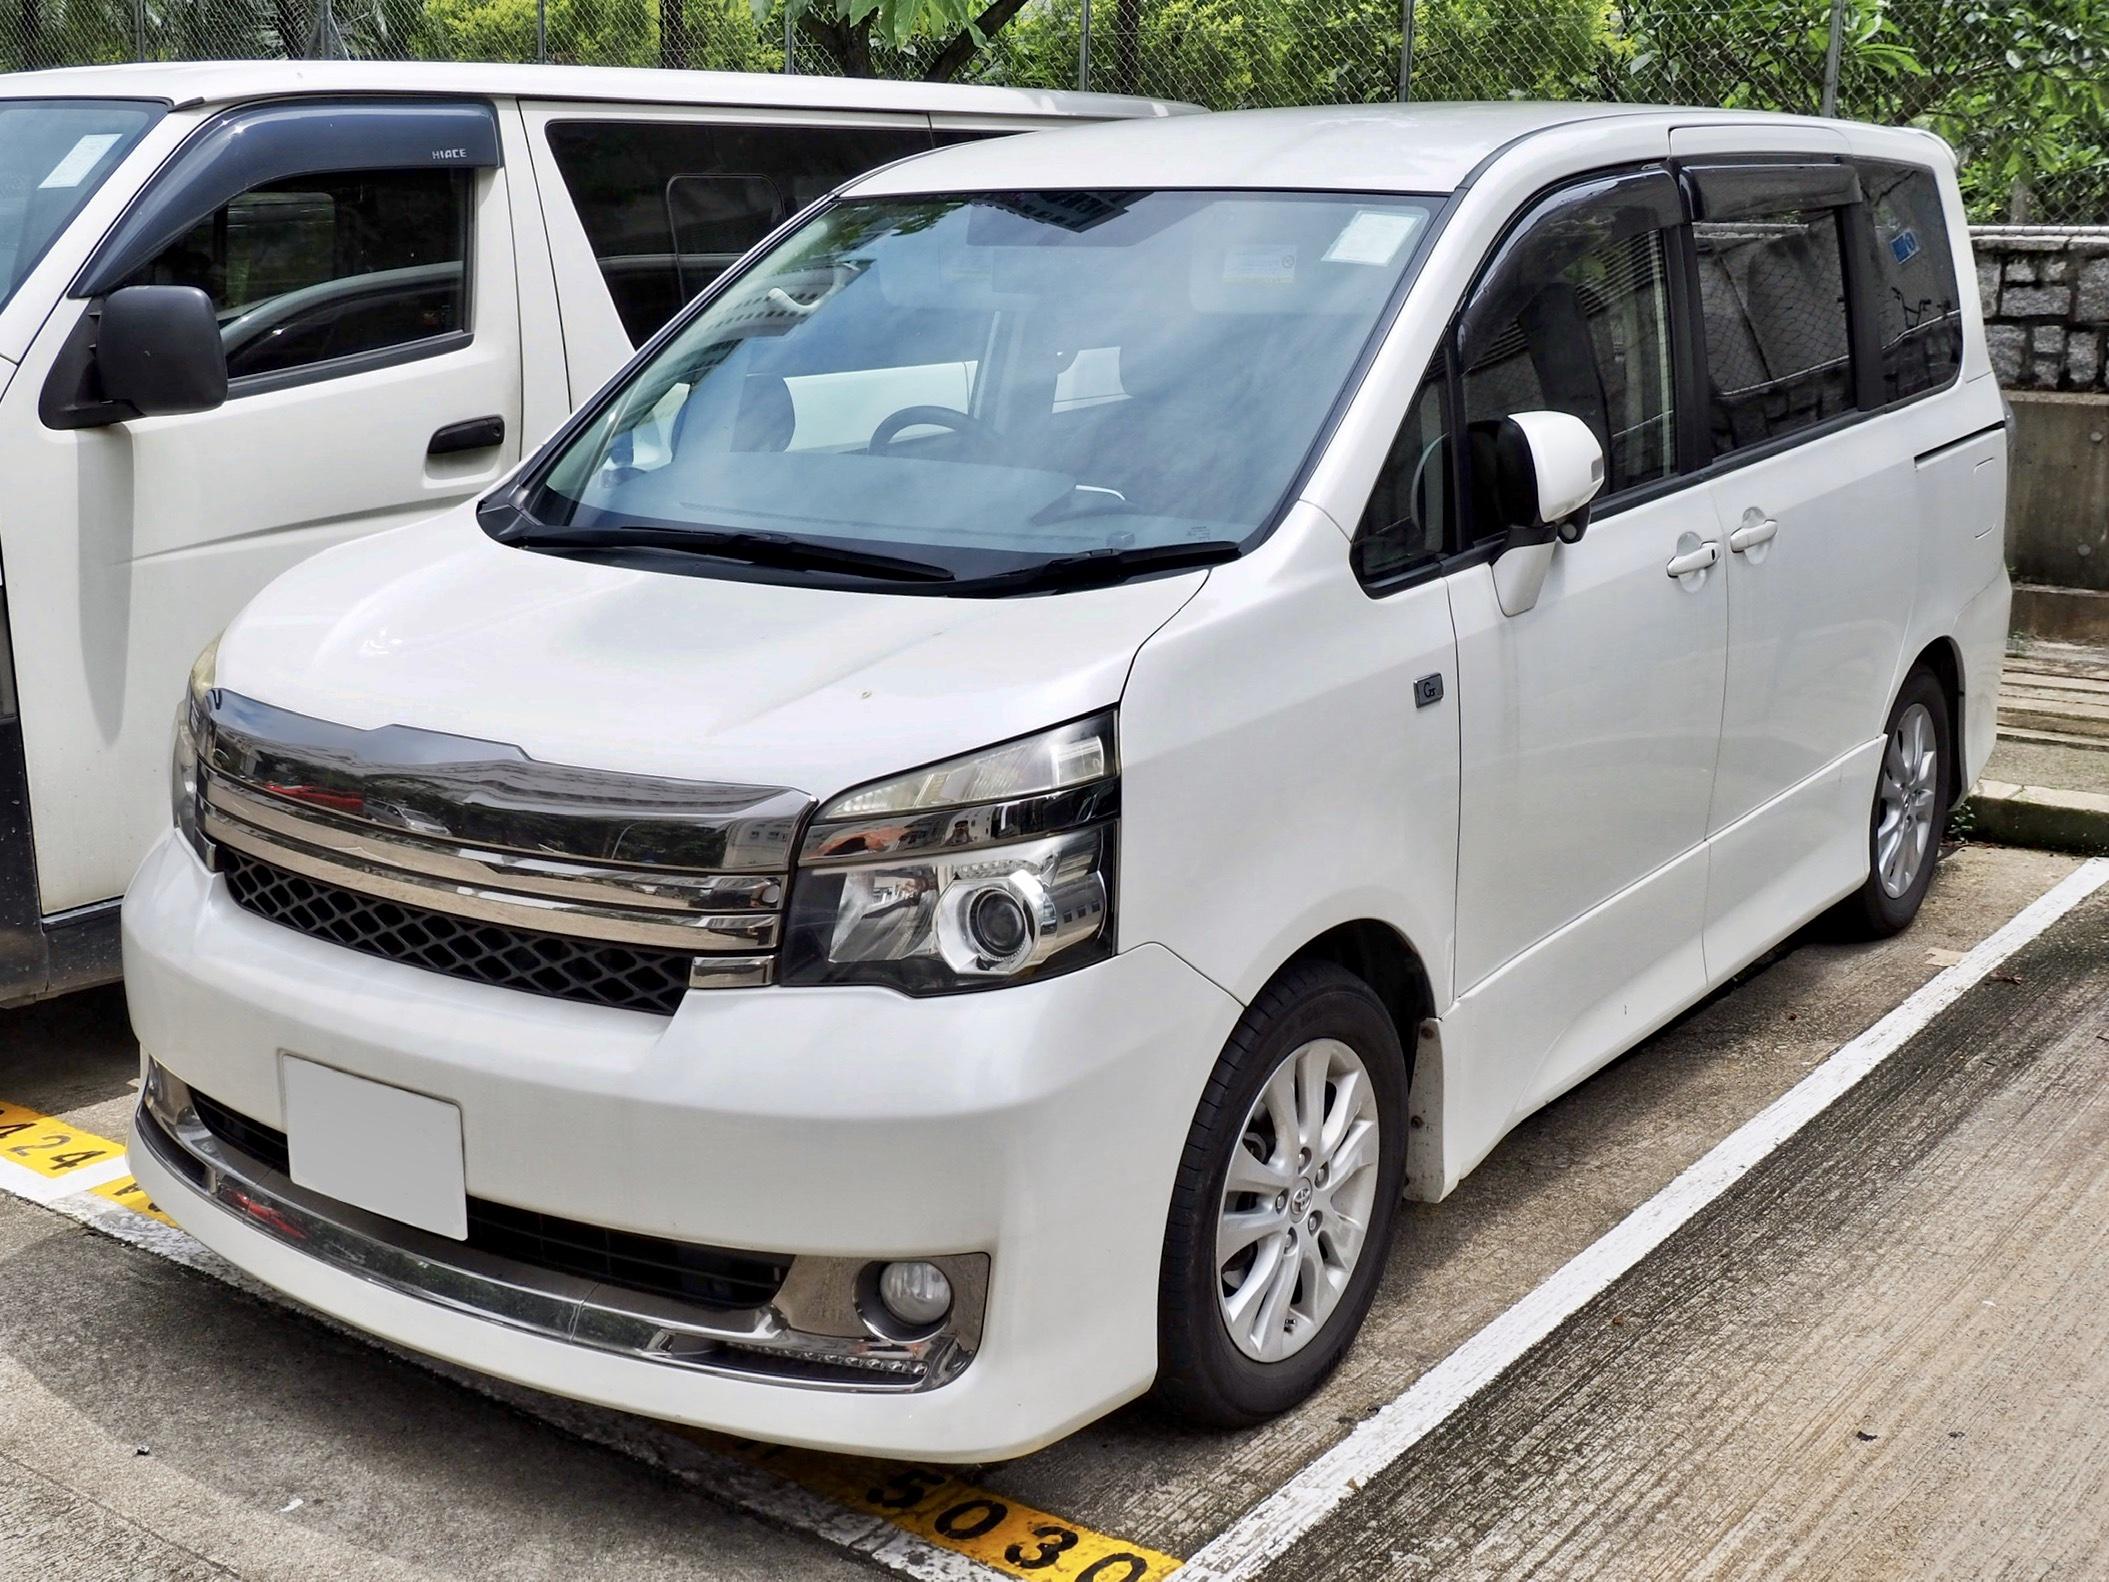 Kelebihan Toyota Voxy Spesifikasi